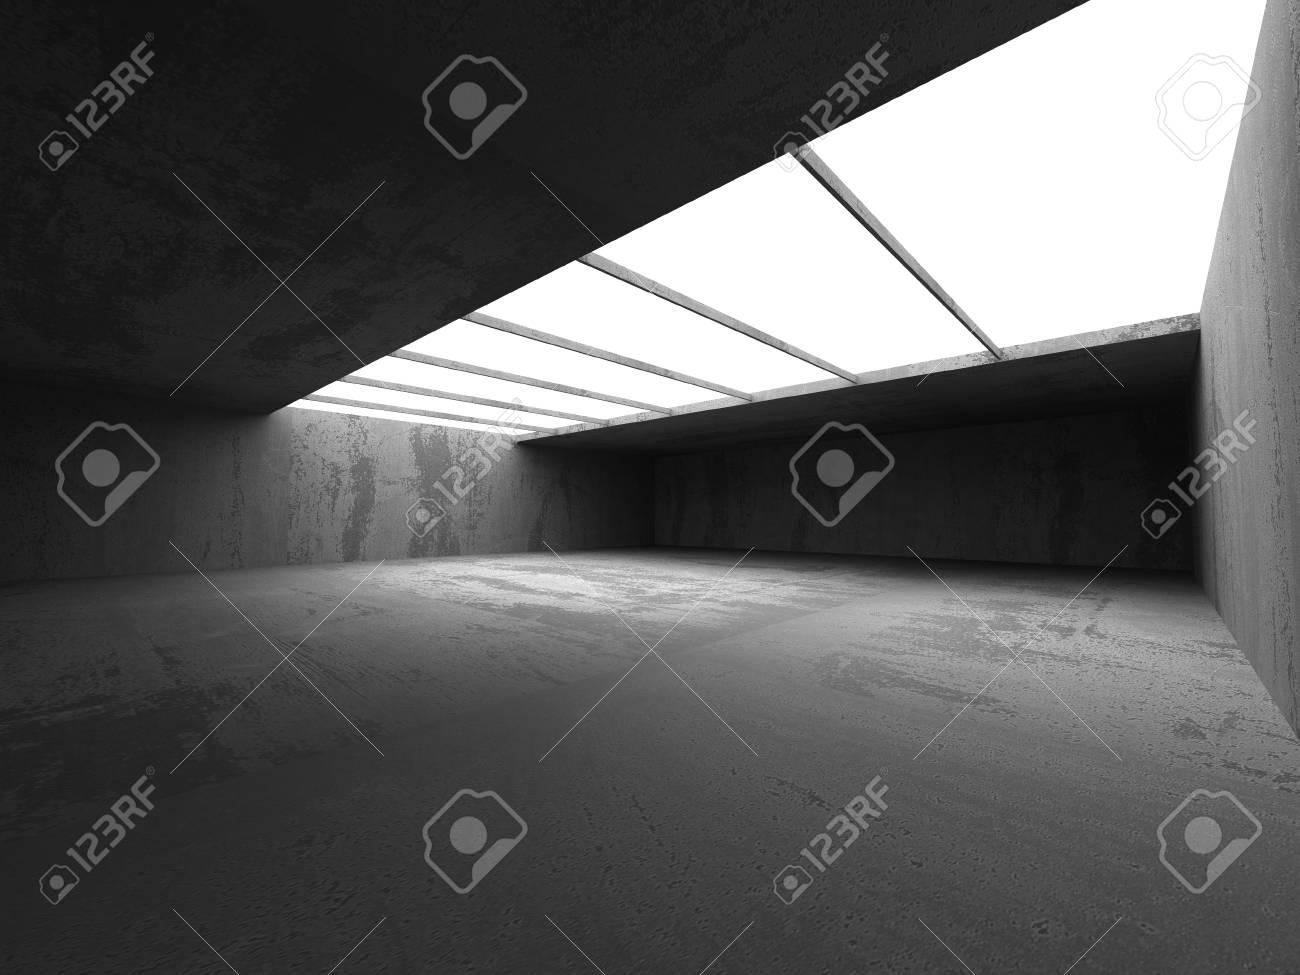 Resumen Antecedentes Arquitectura De Hormigón. Cuarto Oscuro Vacío ...